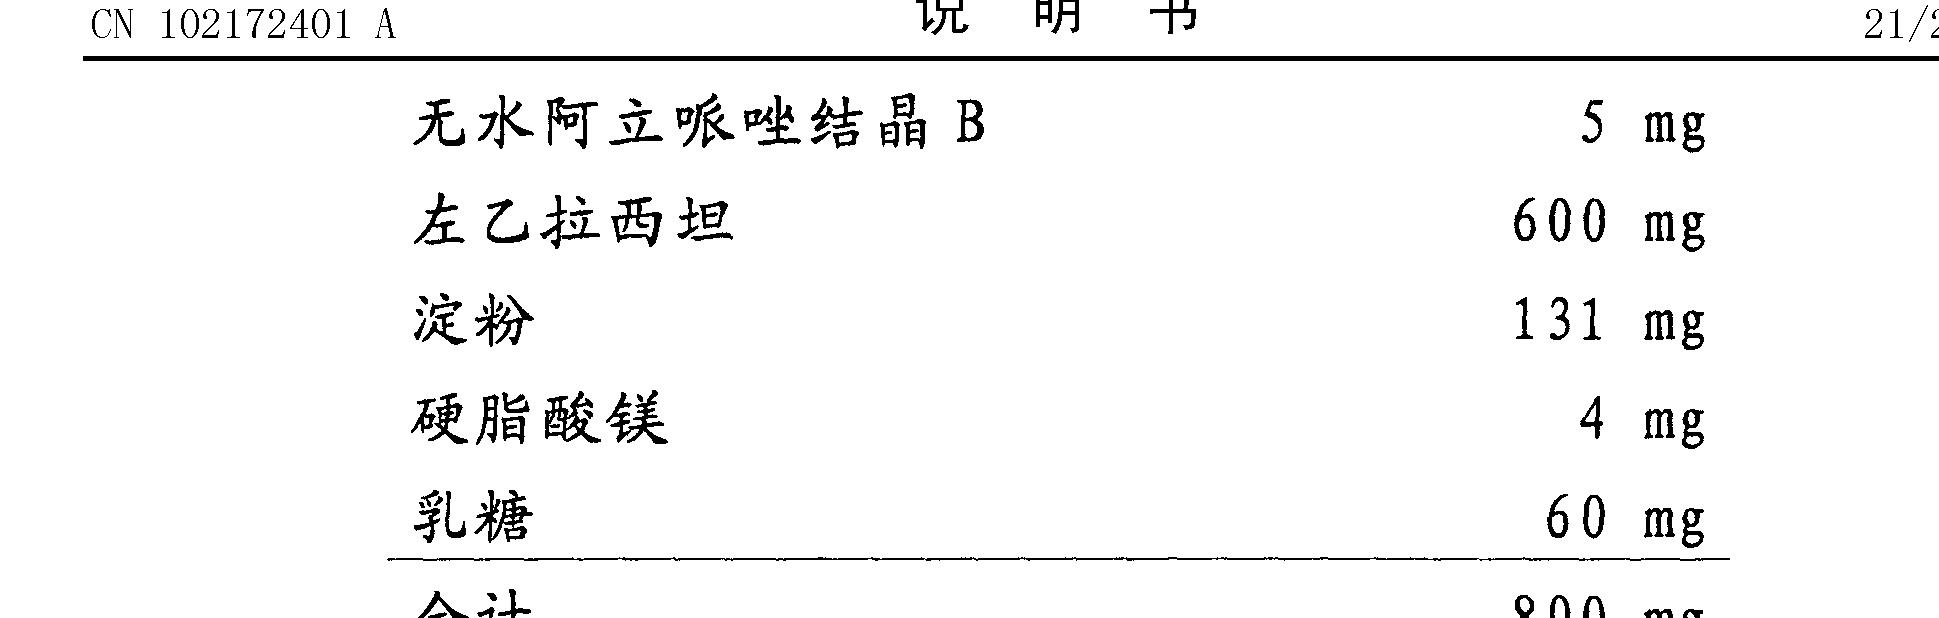 Figure CN102172401AD00231